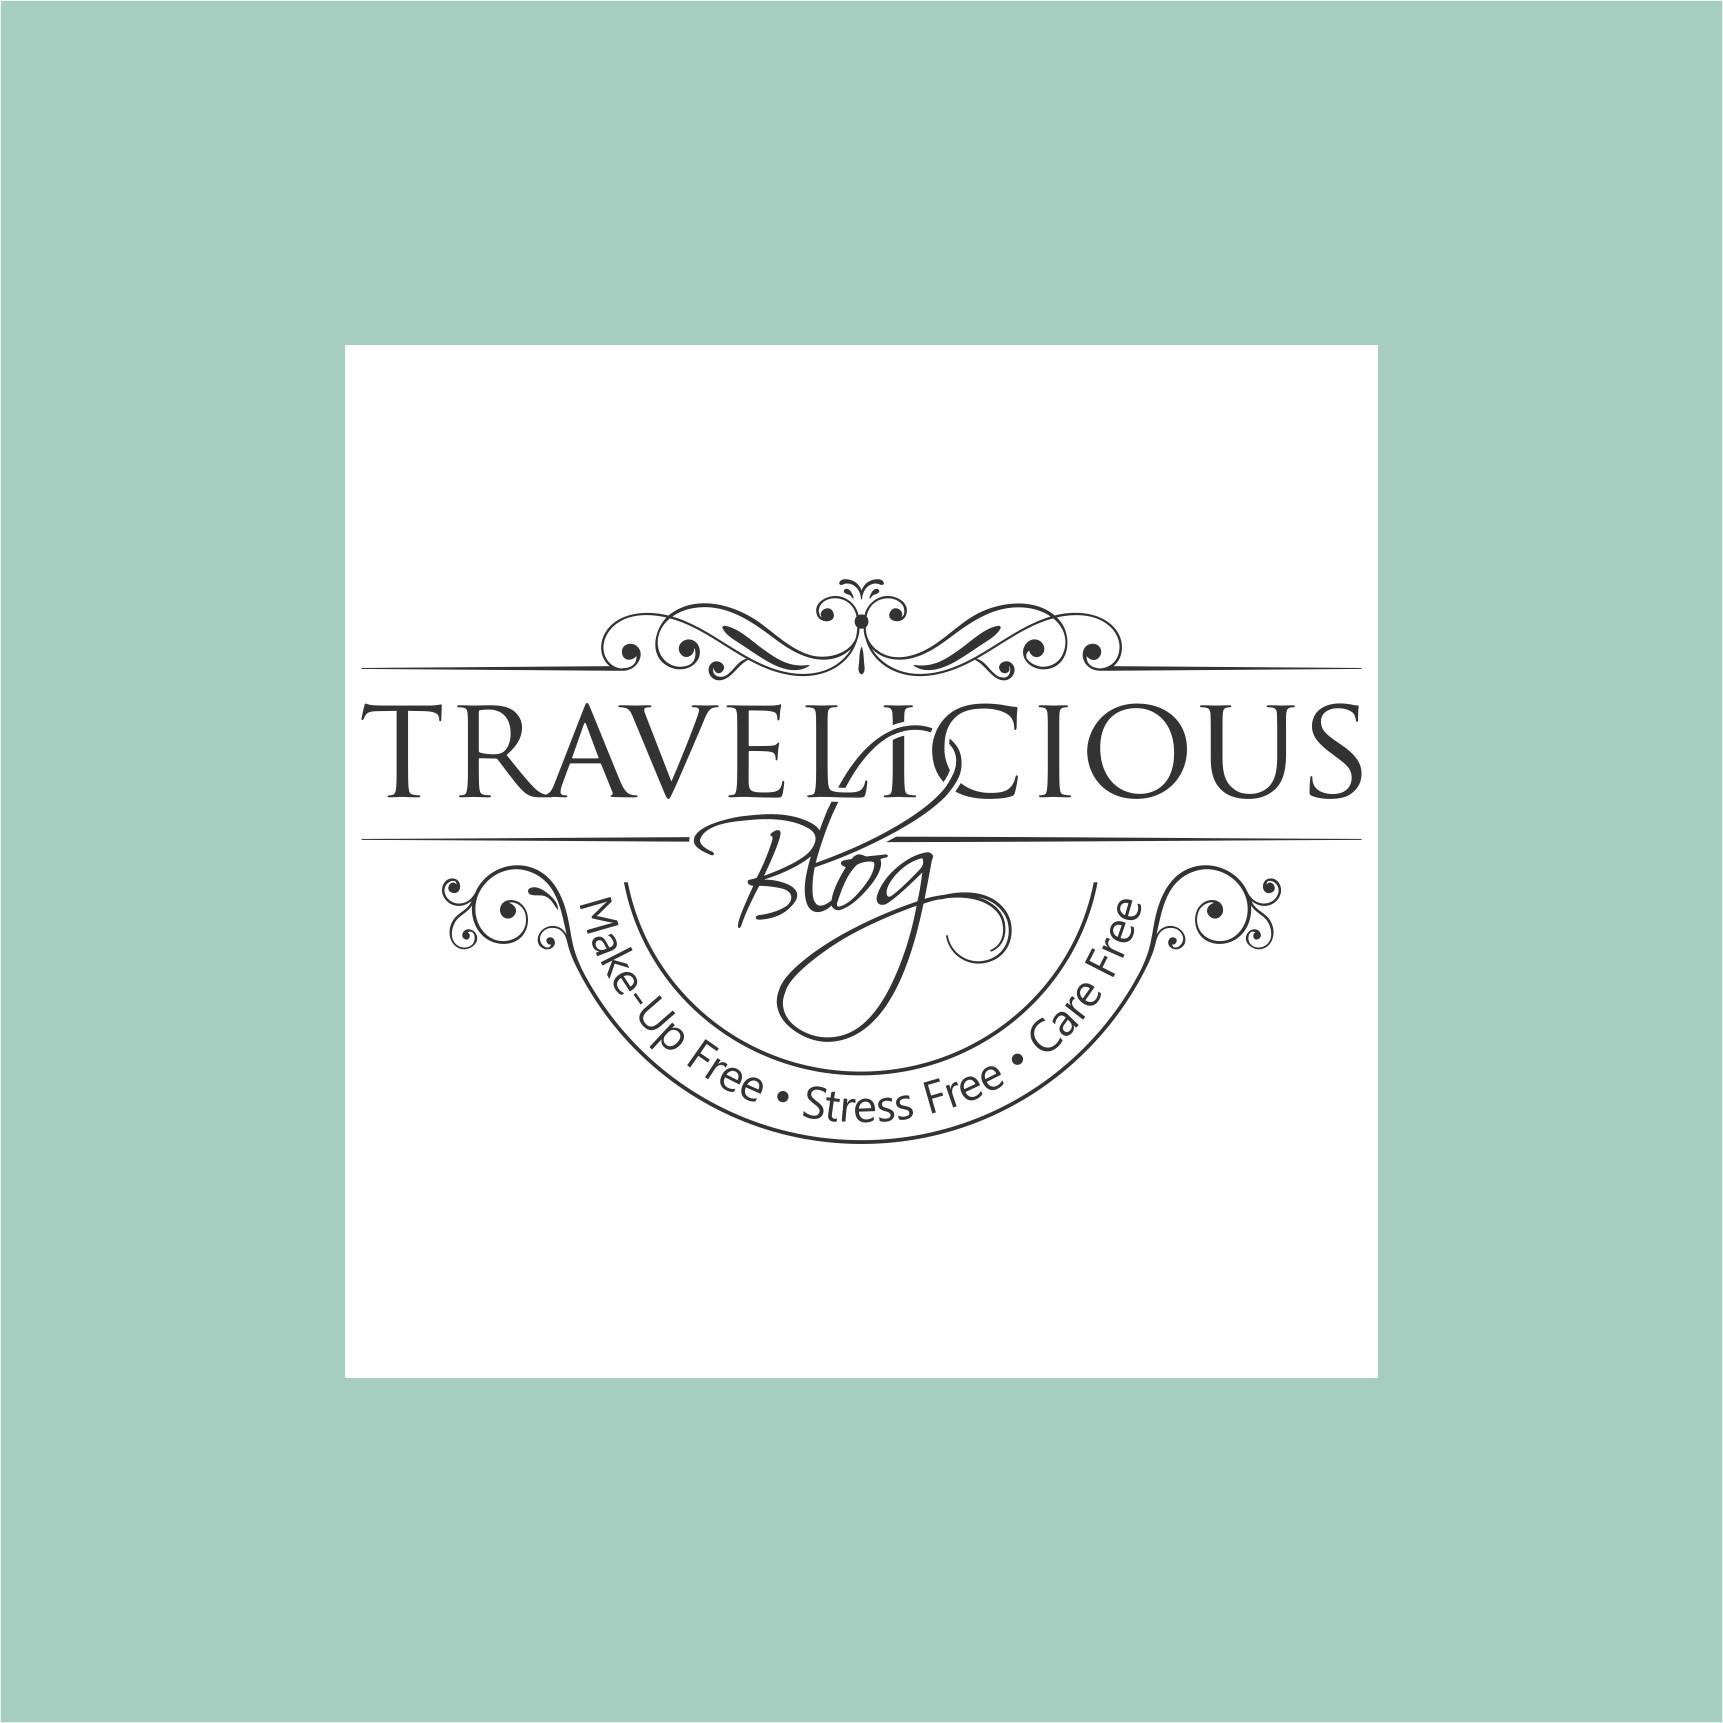 Travelicious Blog Branding!